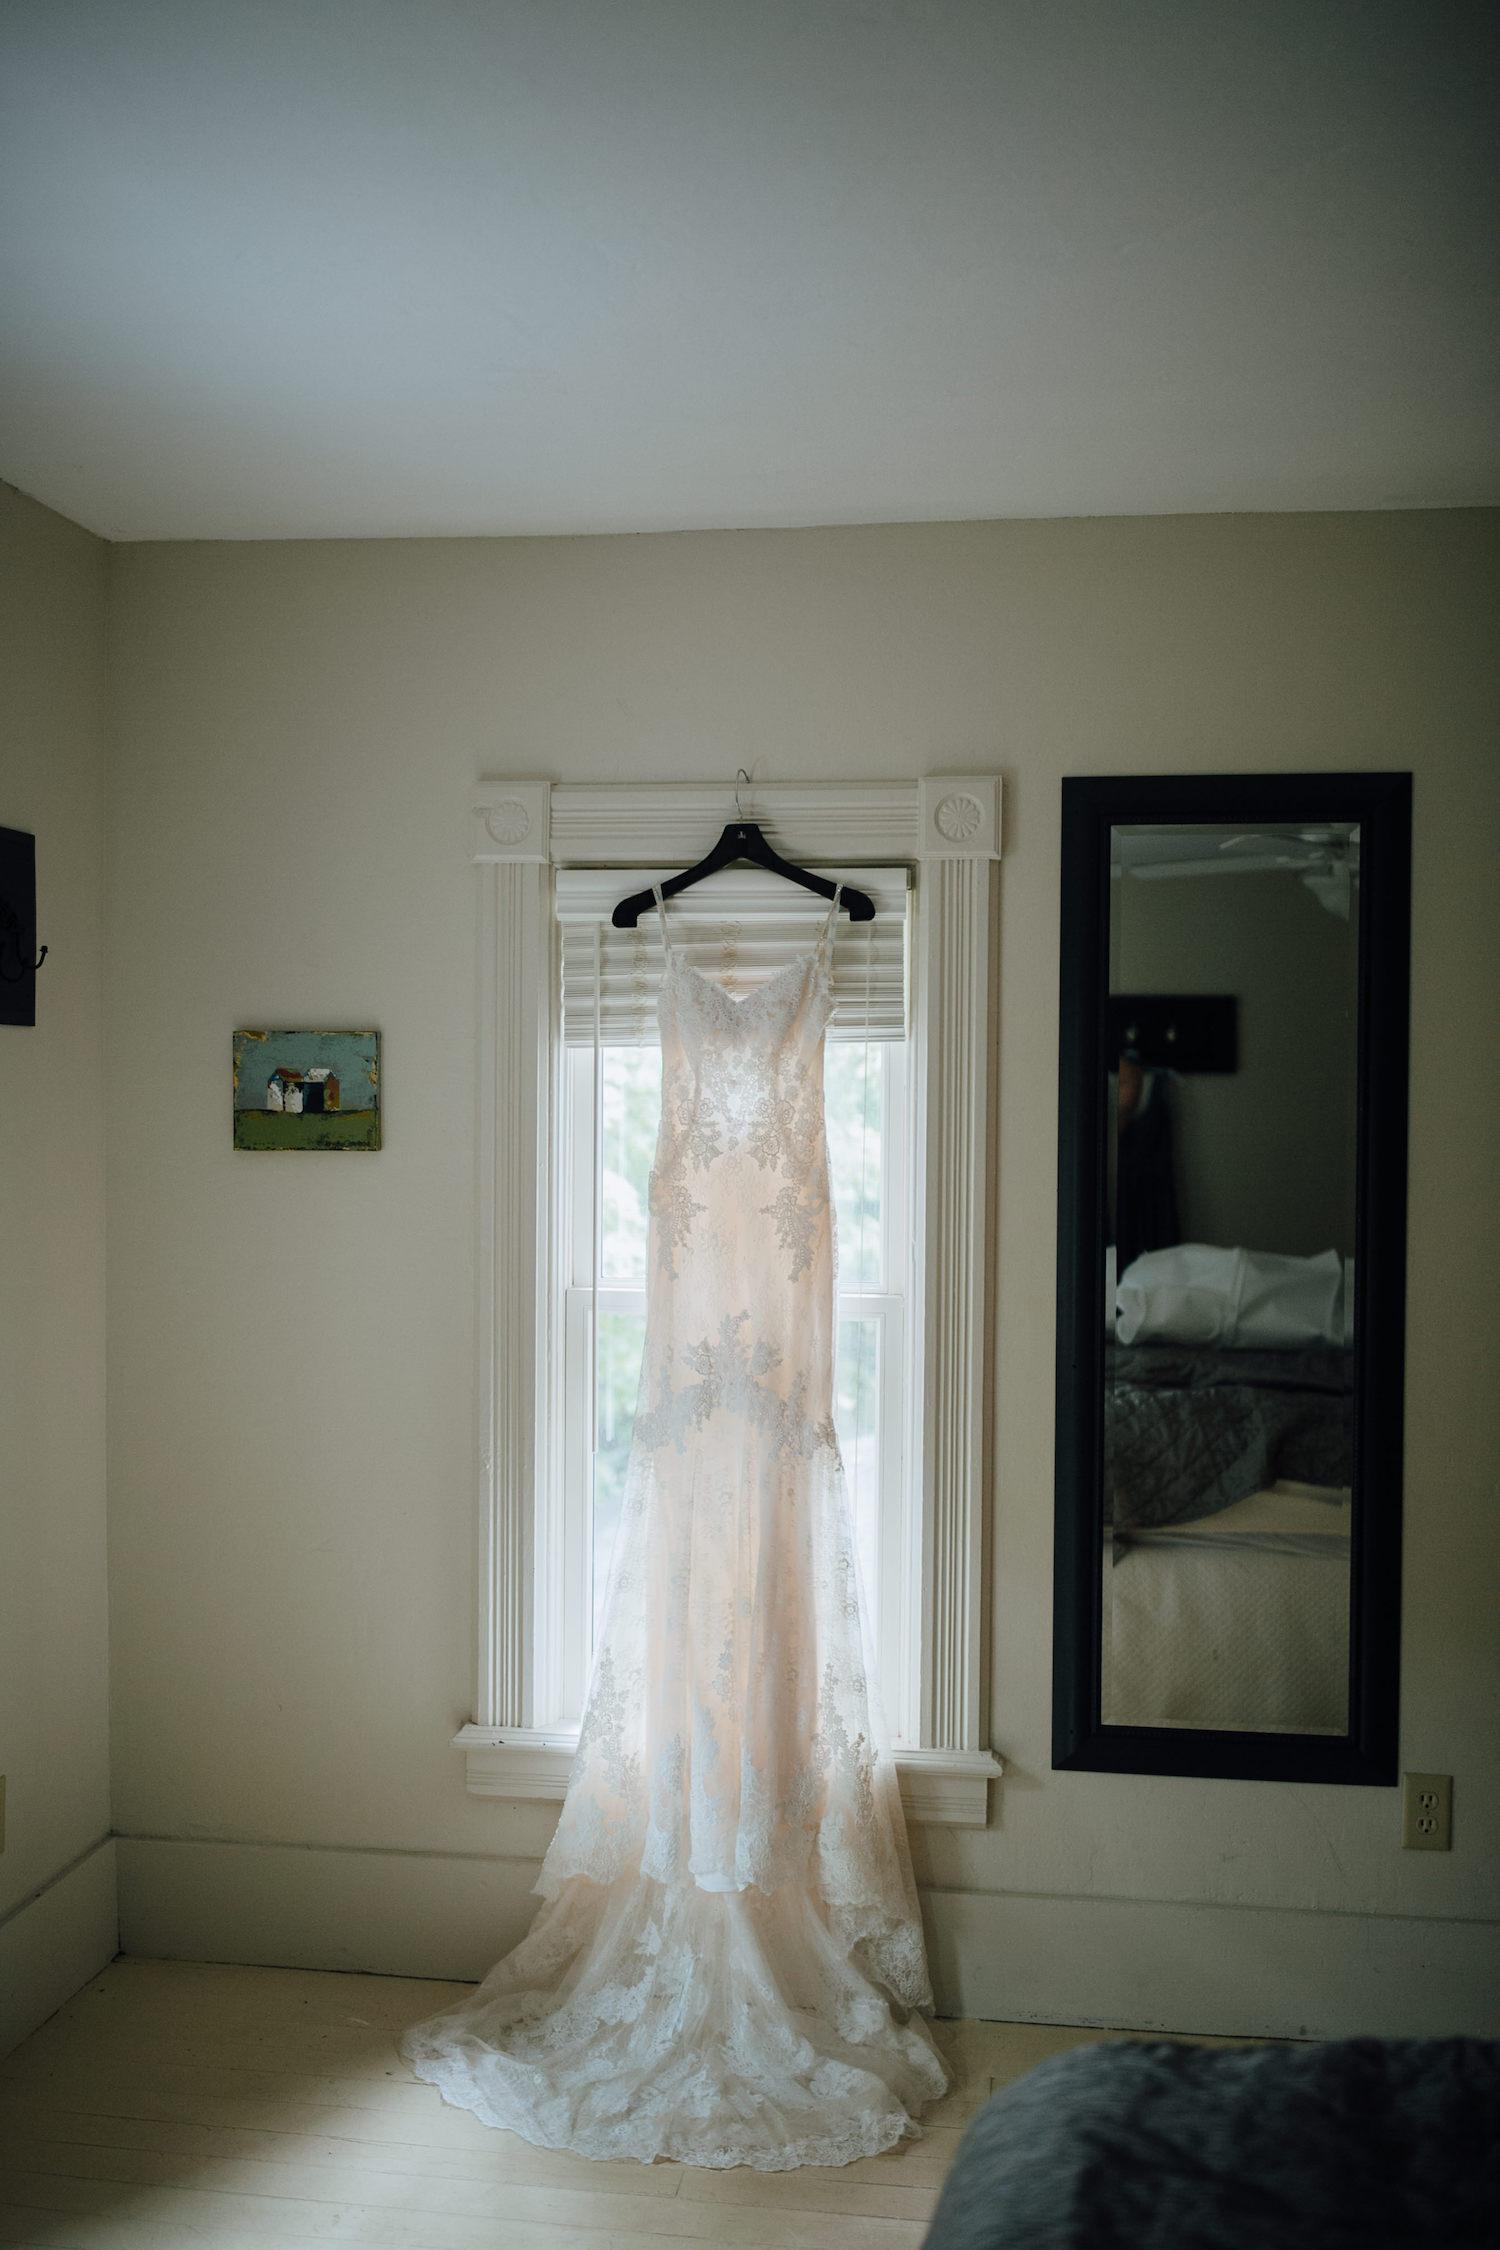 Bride's dress hanging on window at Aurora Cellars wedding